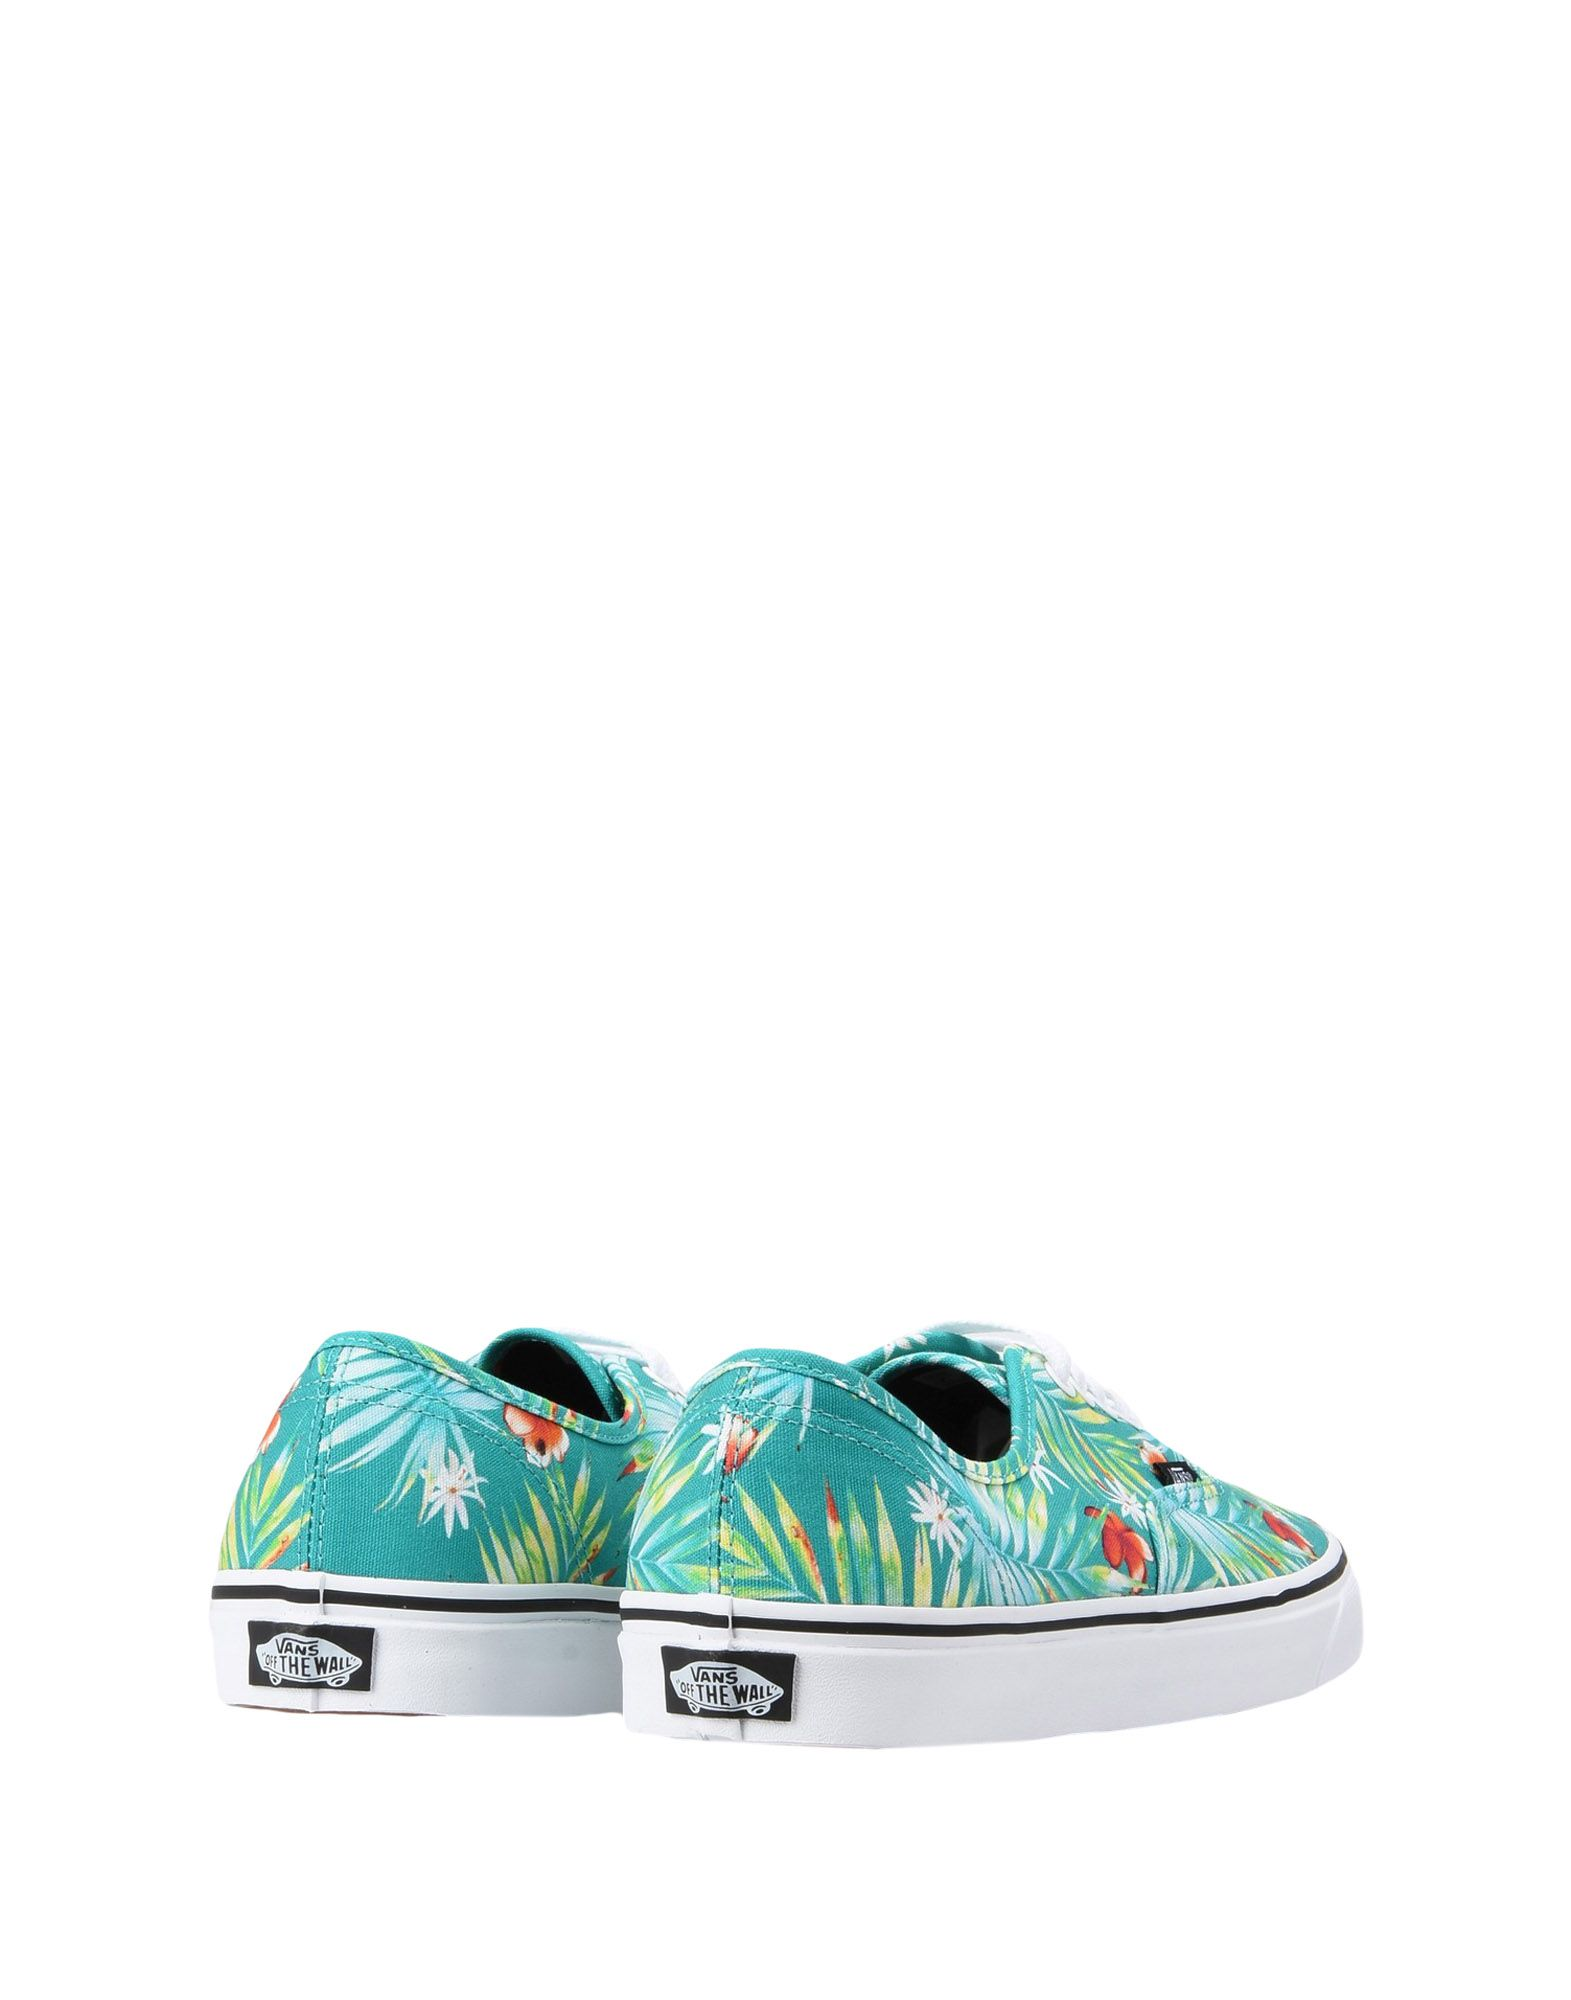 Sneakers Vans Ua Authentic - Decay Palms - Homme - Sneakers Vans sur